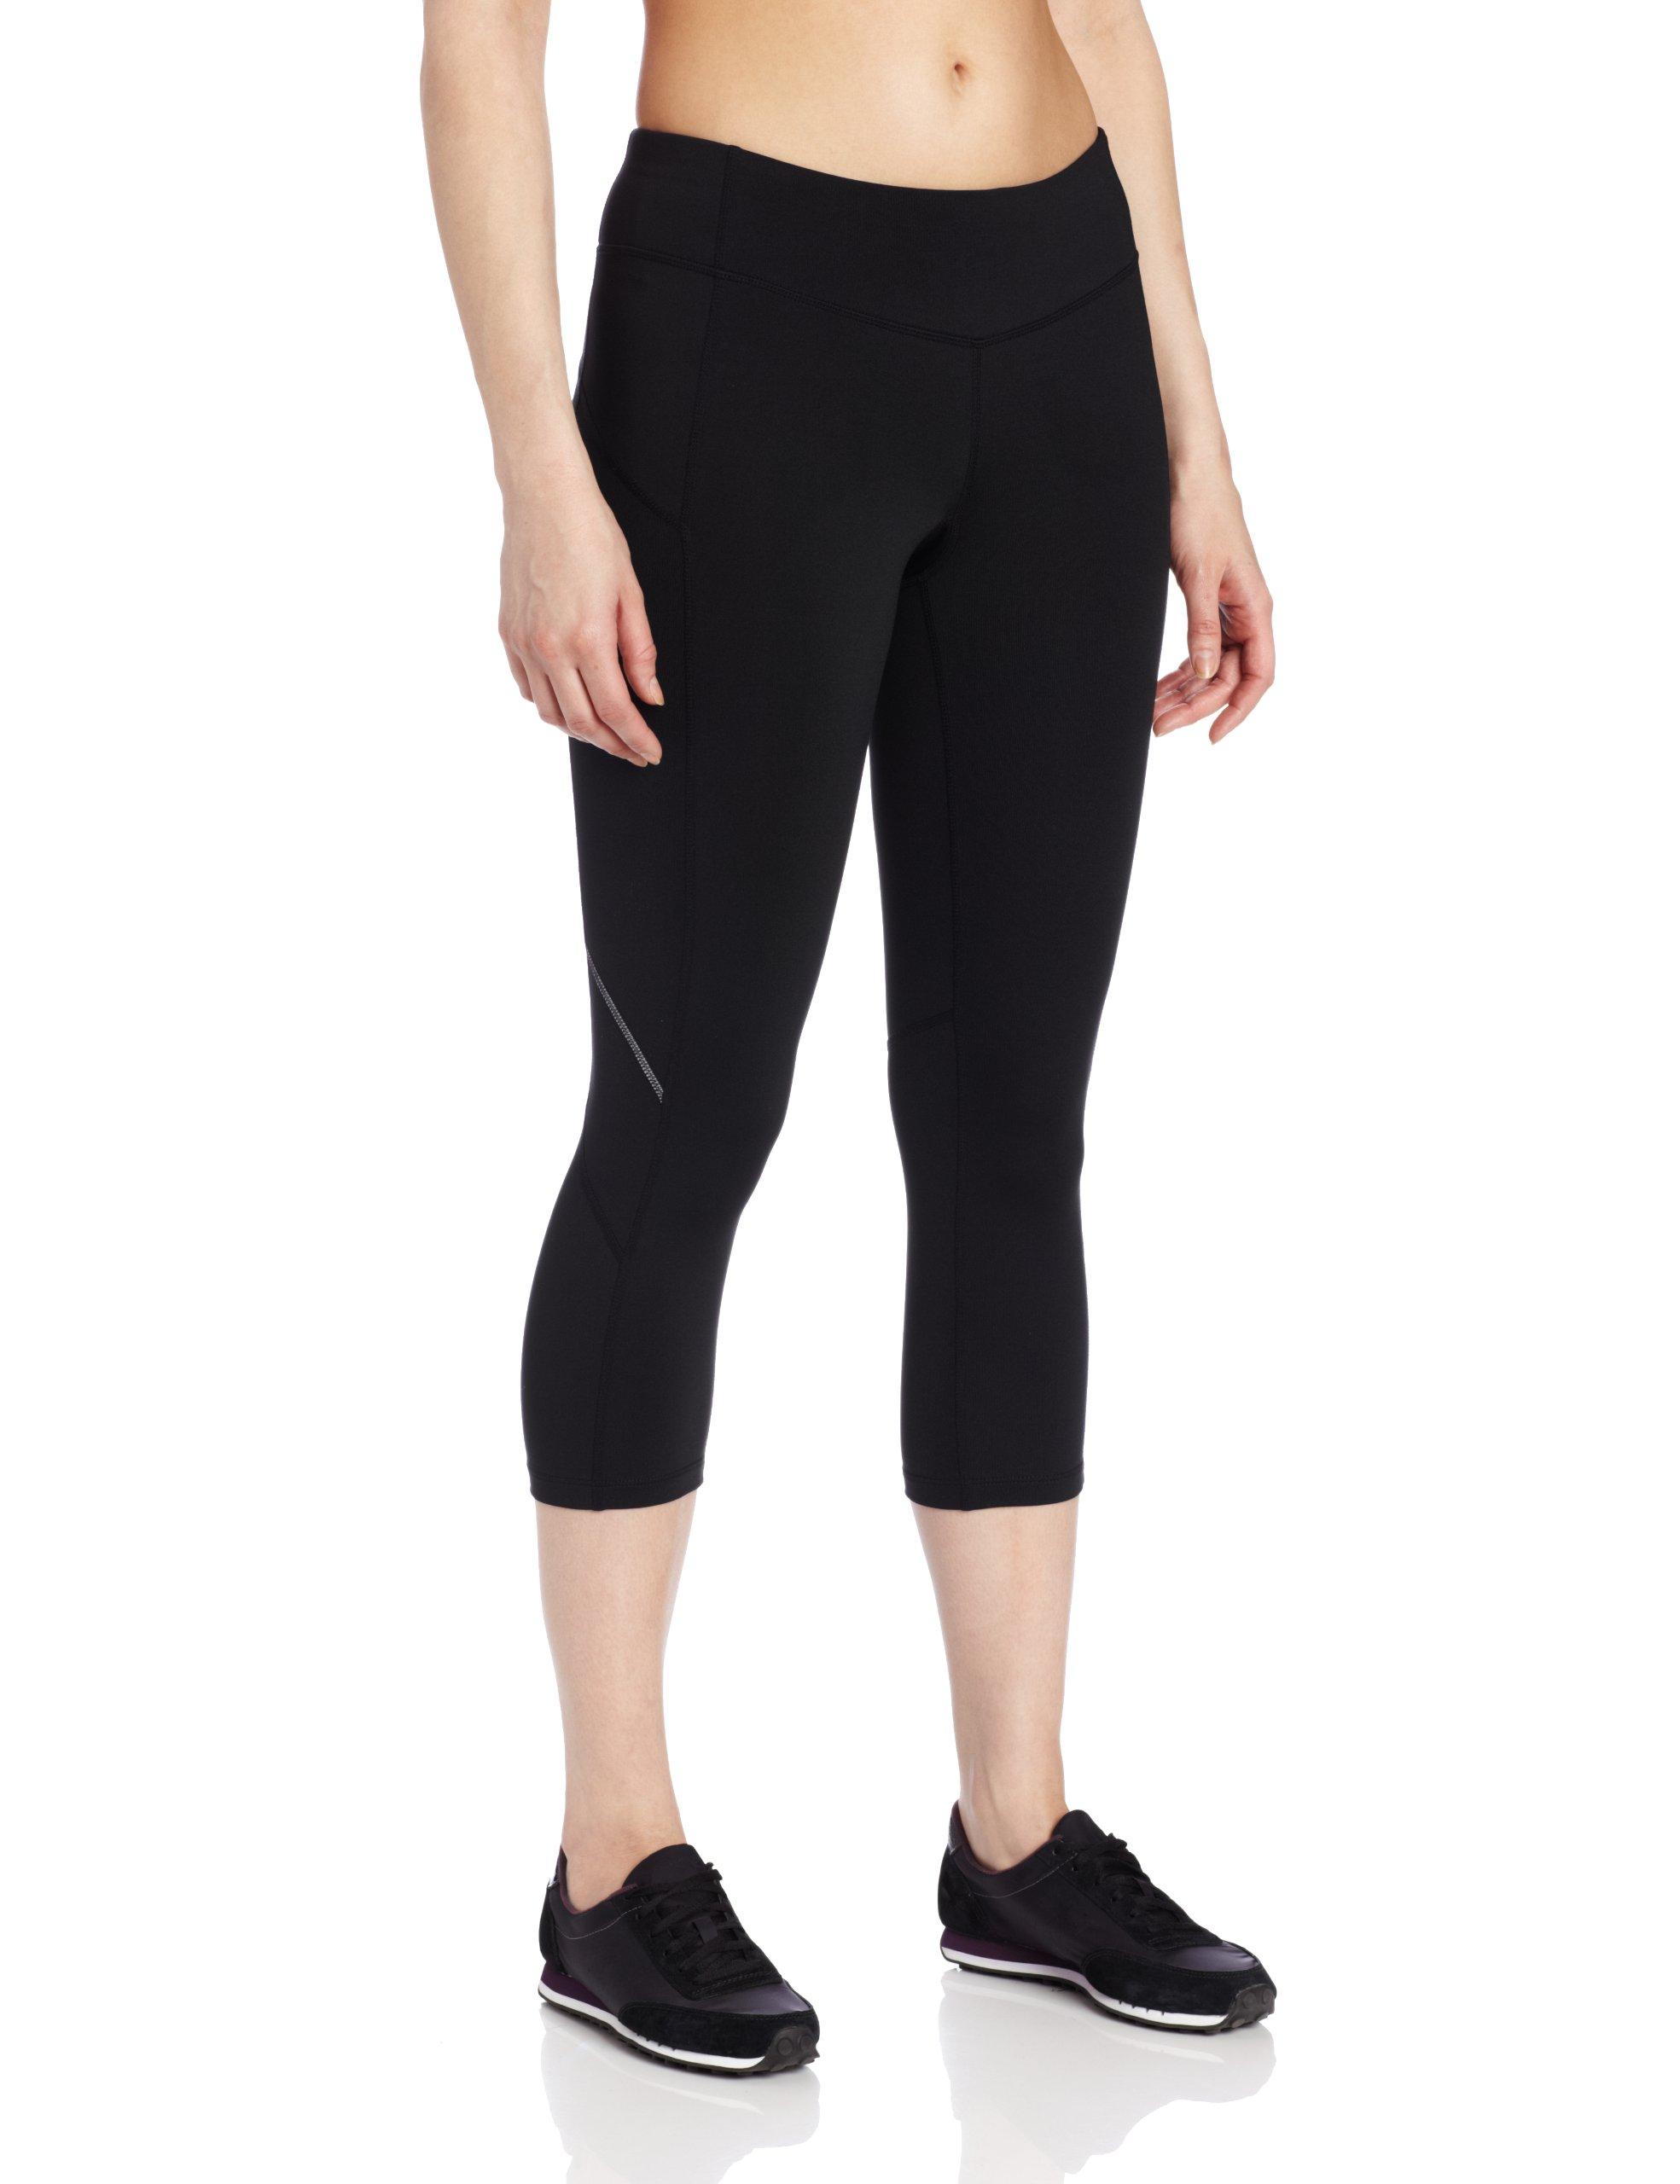 Skirt Sports Women's Redemption Capri Pants, Black Pants XL X 19